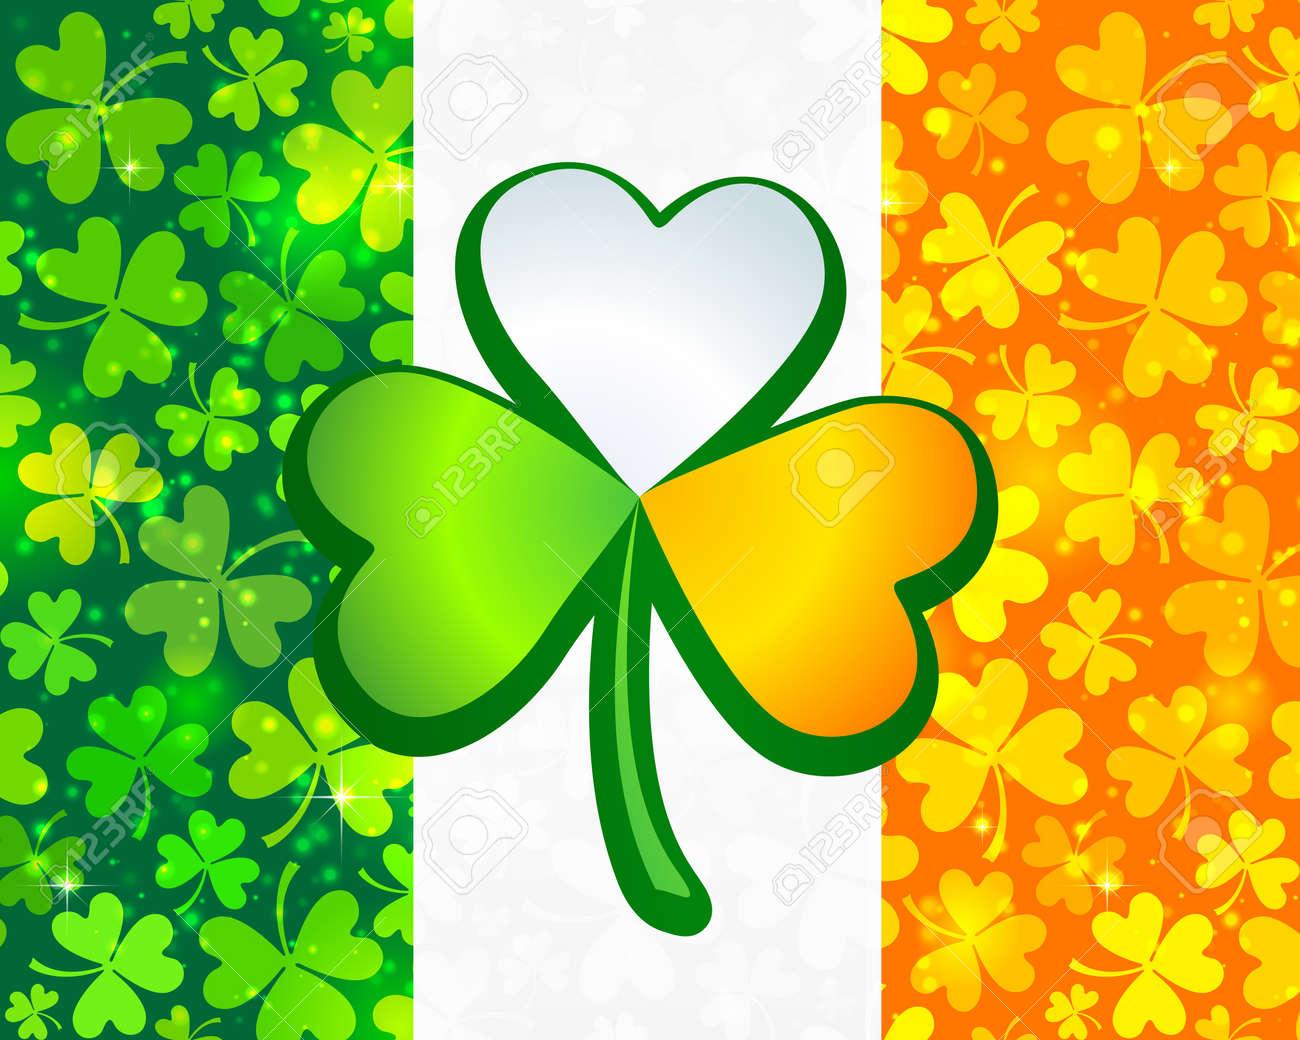 Irish flag from green and orange clovers Stock Photo - 18209282